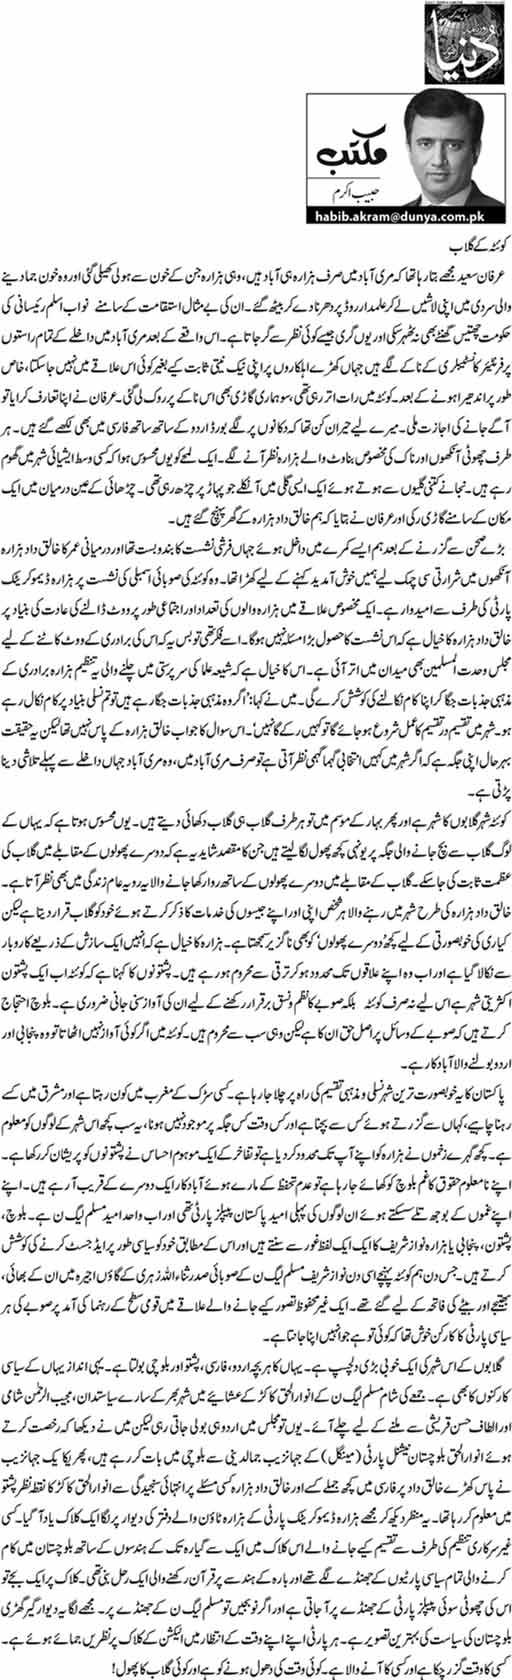 Quetta K Ghulab - Habib Akram